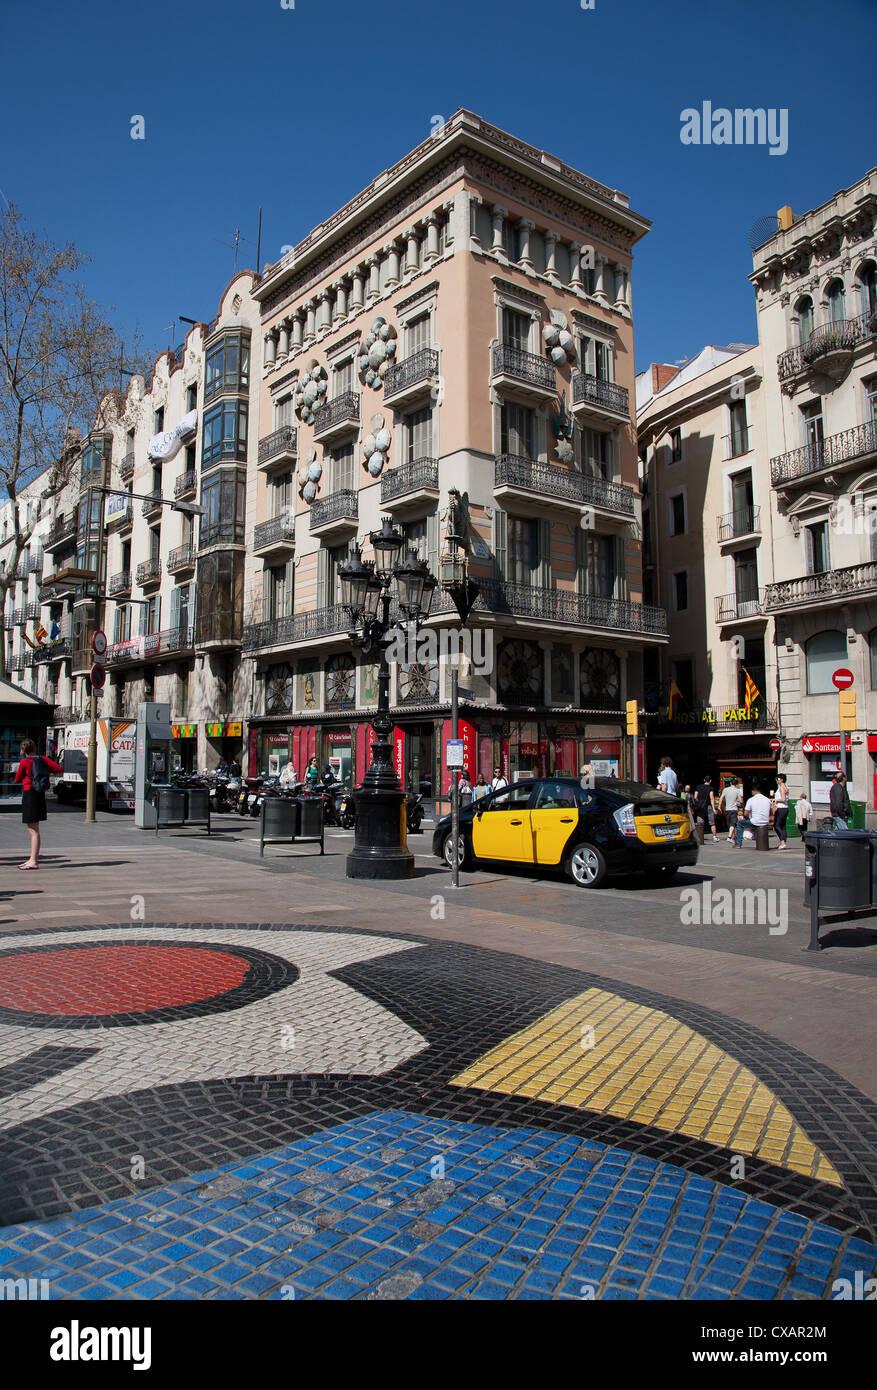 Pavement mosaic by Joan Miro on Las Ramblas, Barcelona, Catalonia, Spain, Europe - Stock Image